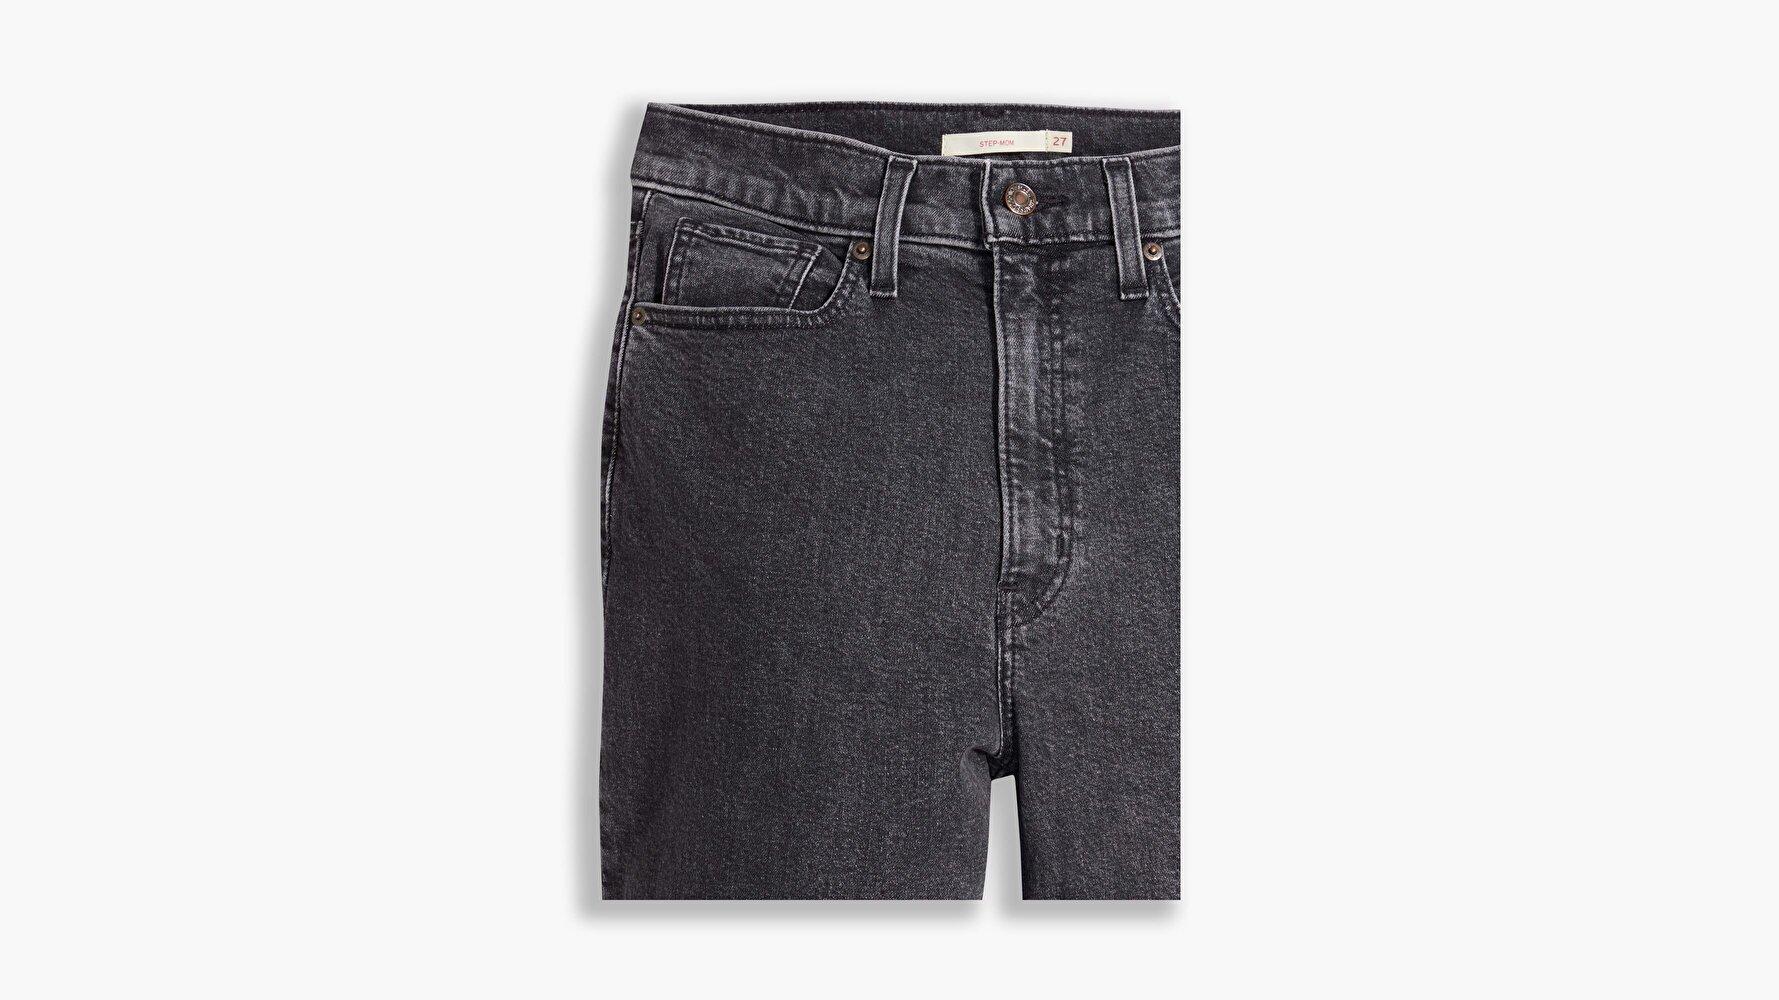 Yüksek Bel Tapered Fit Kadın Jean Pantolon-Bomb Dot Com